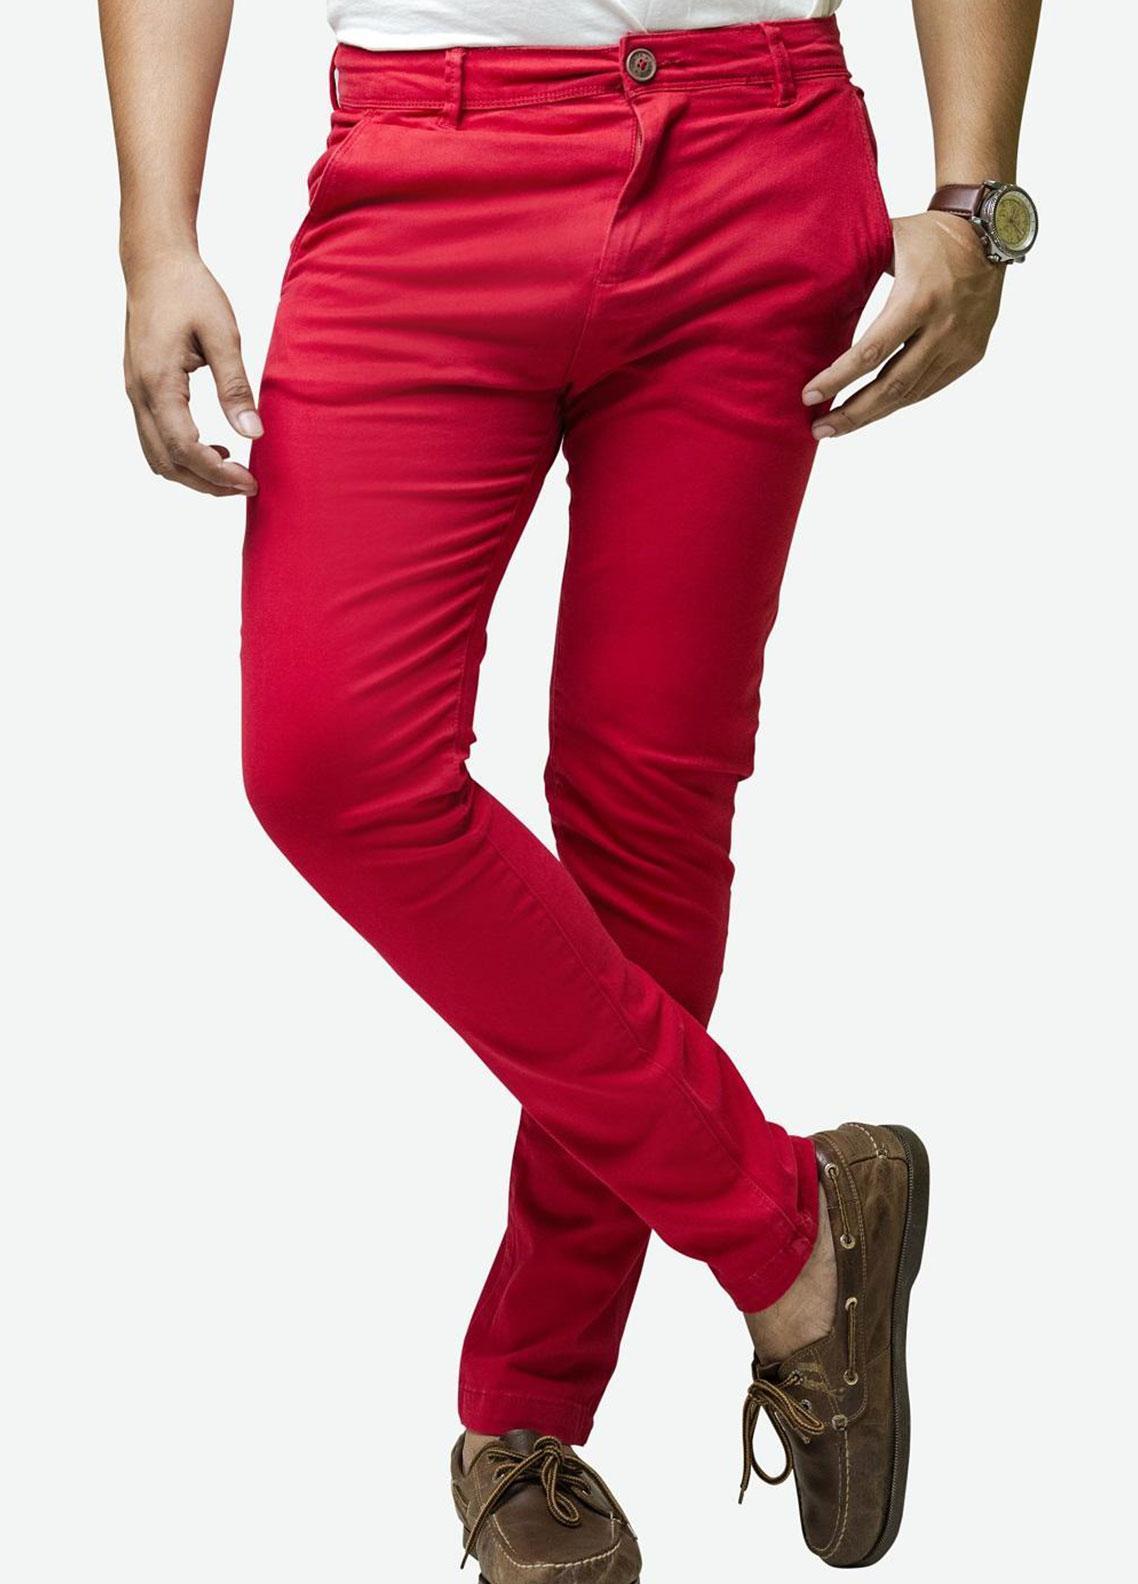 Ignite Wardrobe Cotton Slim Fit Chino Pants for Men -  IG20PNM 027